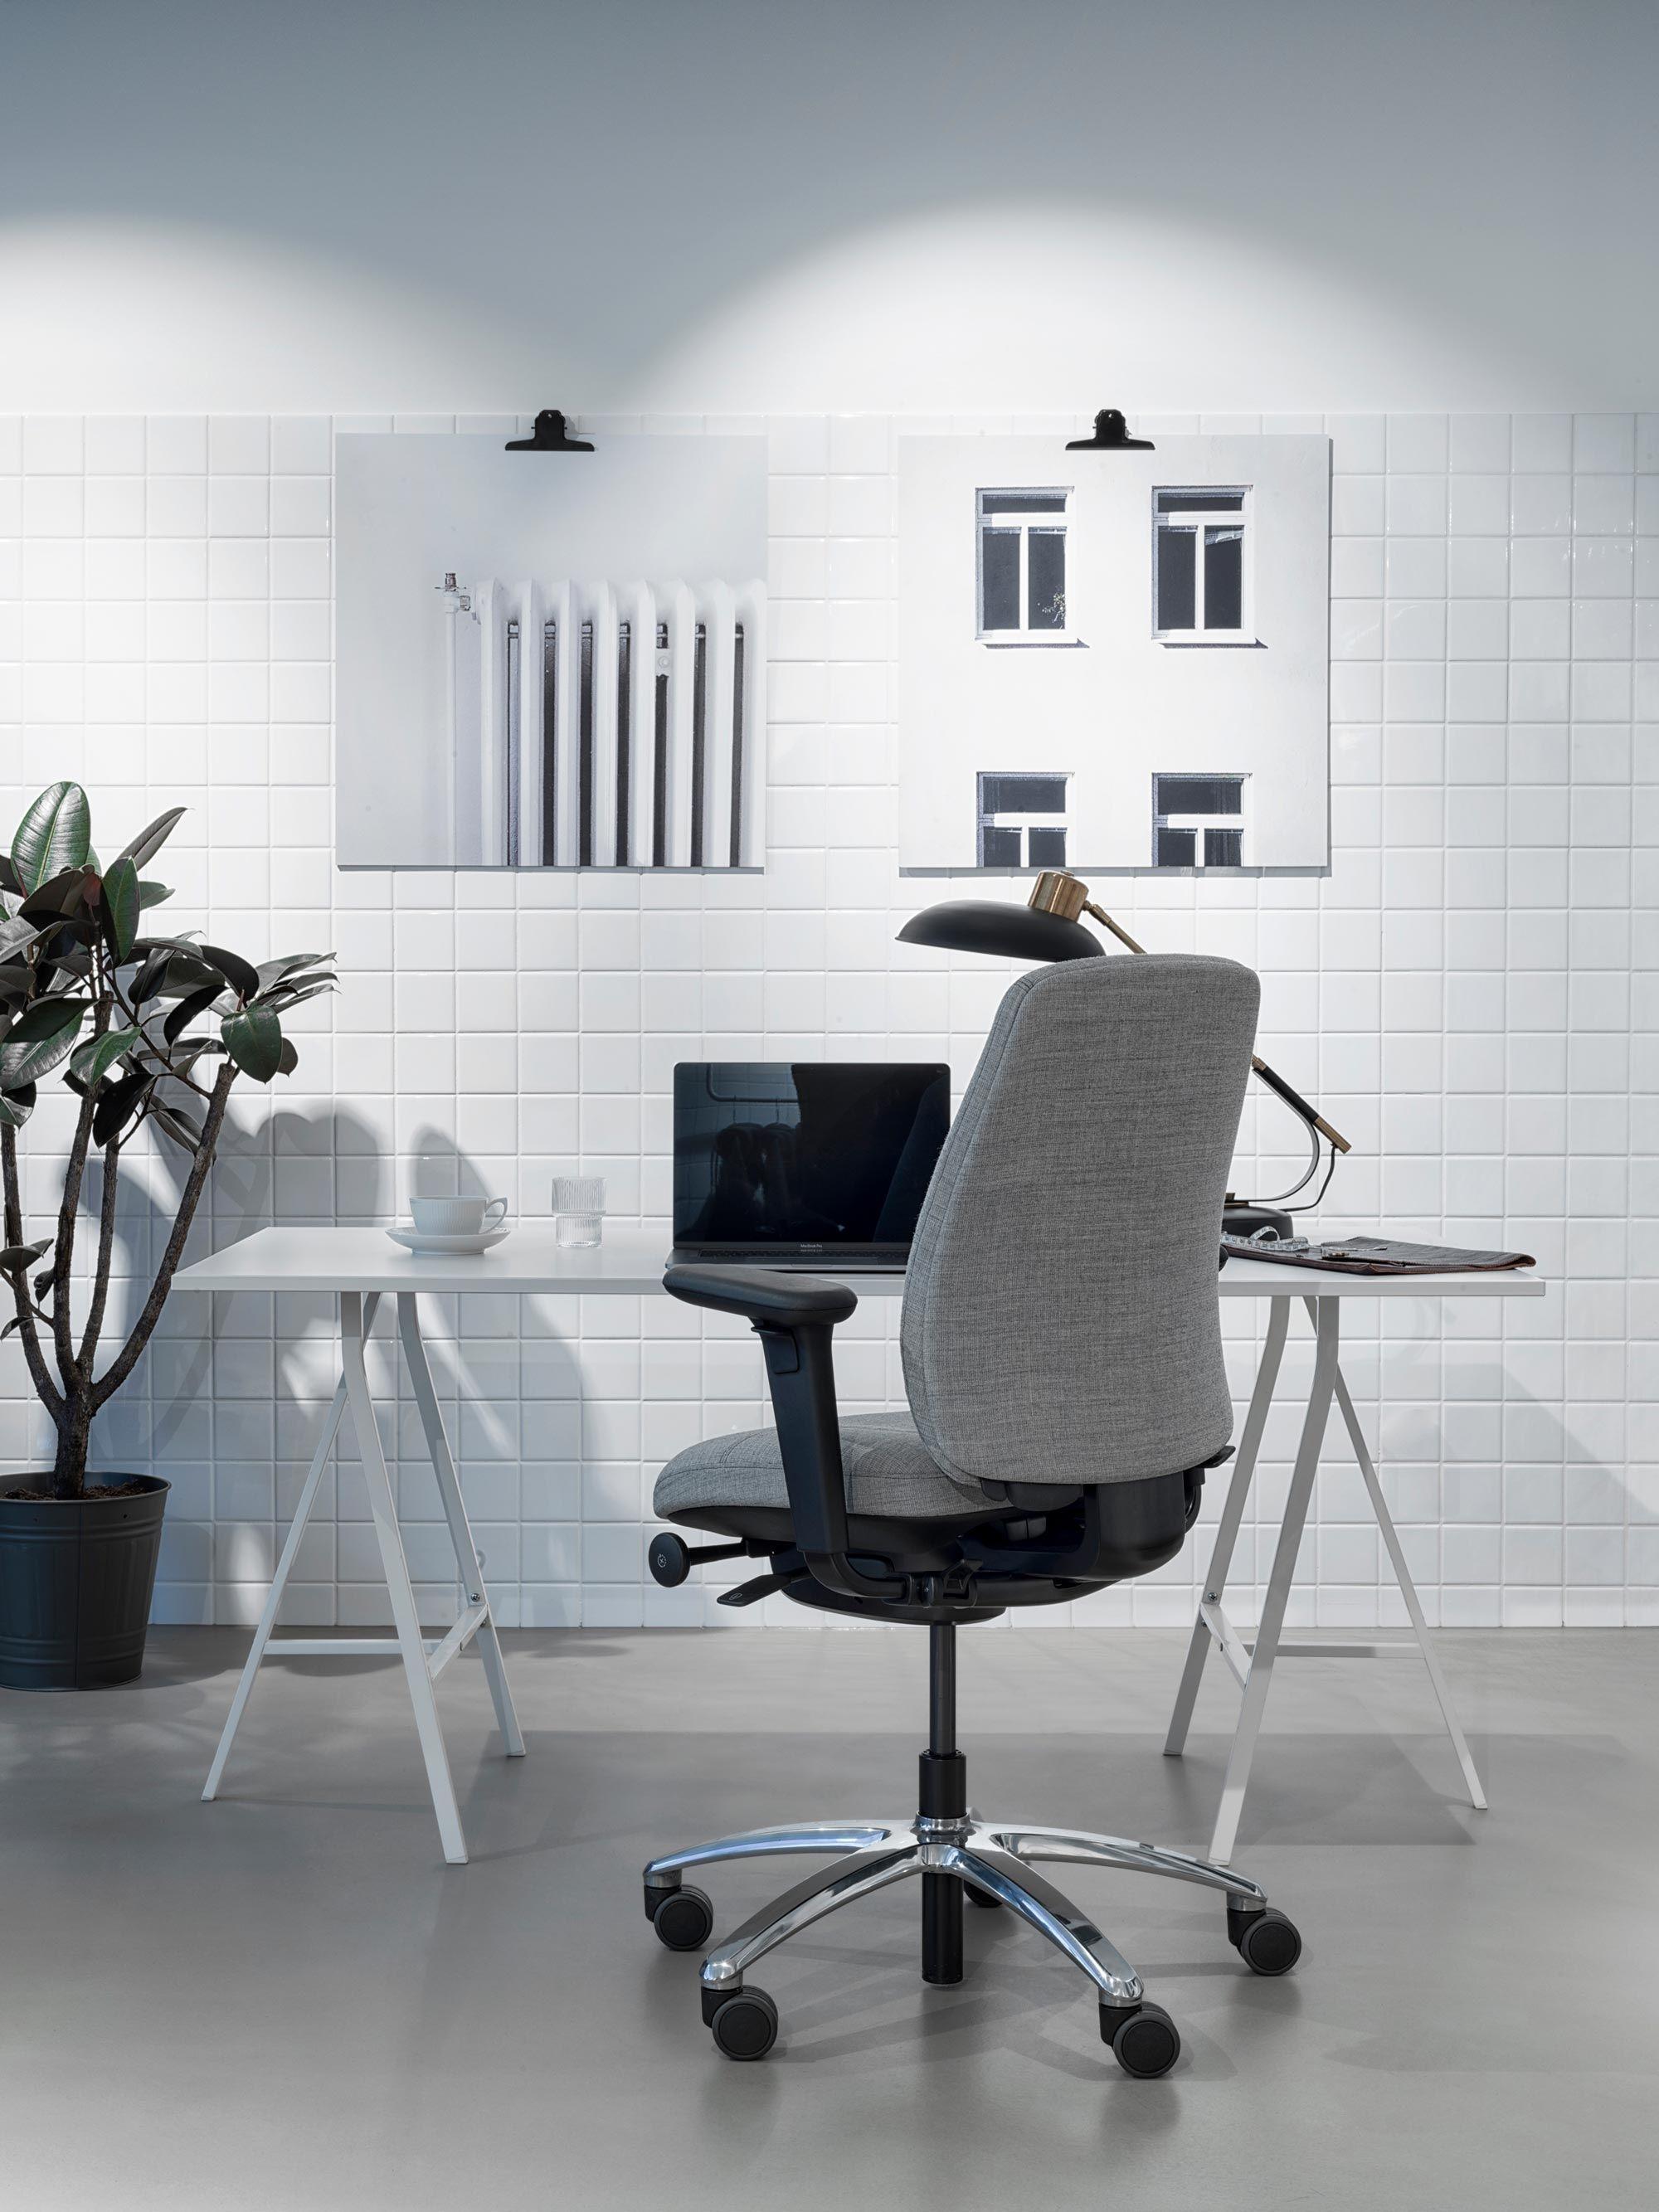 Minimal Office Chair Rh New Logic Scandinavian Design Flokk In 2020 Comfortable Office Chair New Logic Workspace Inspiration